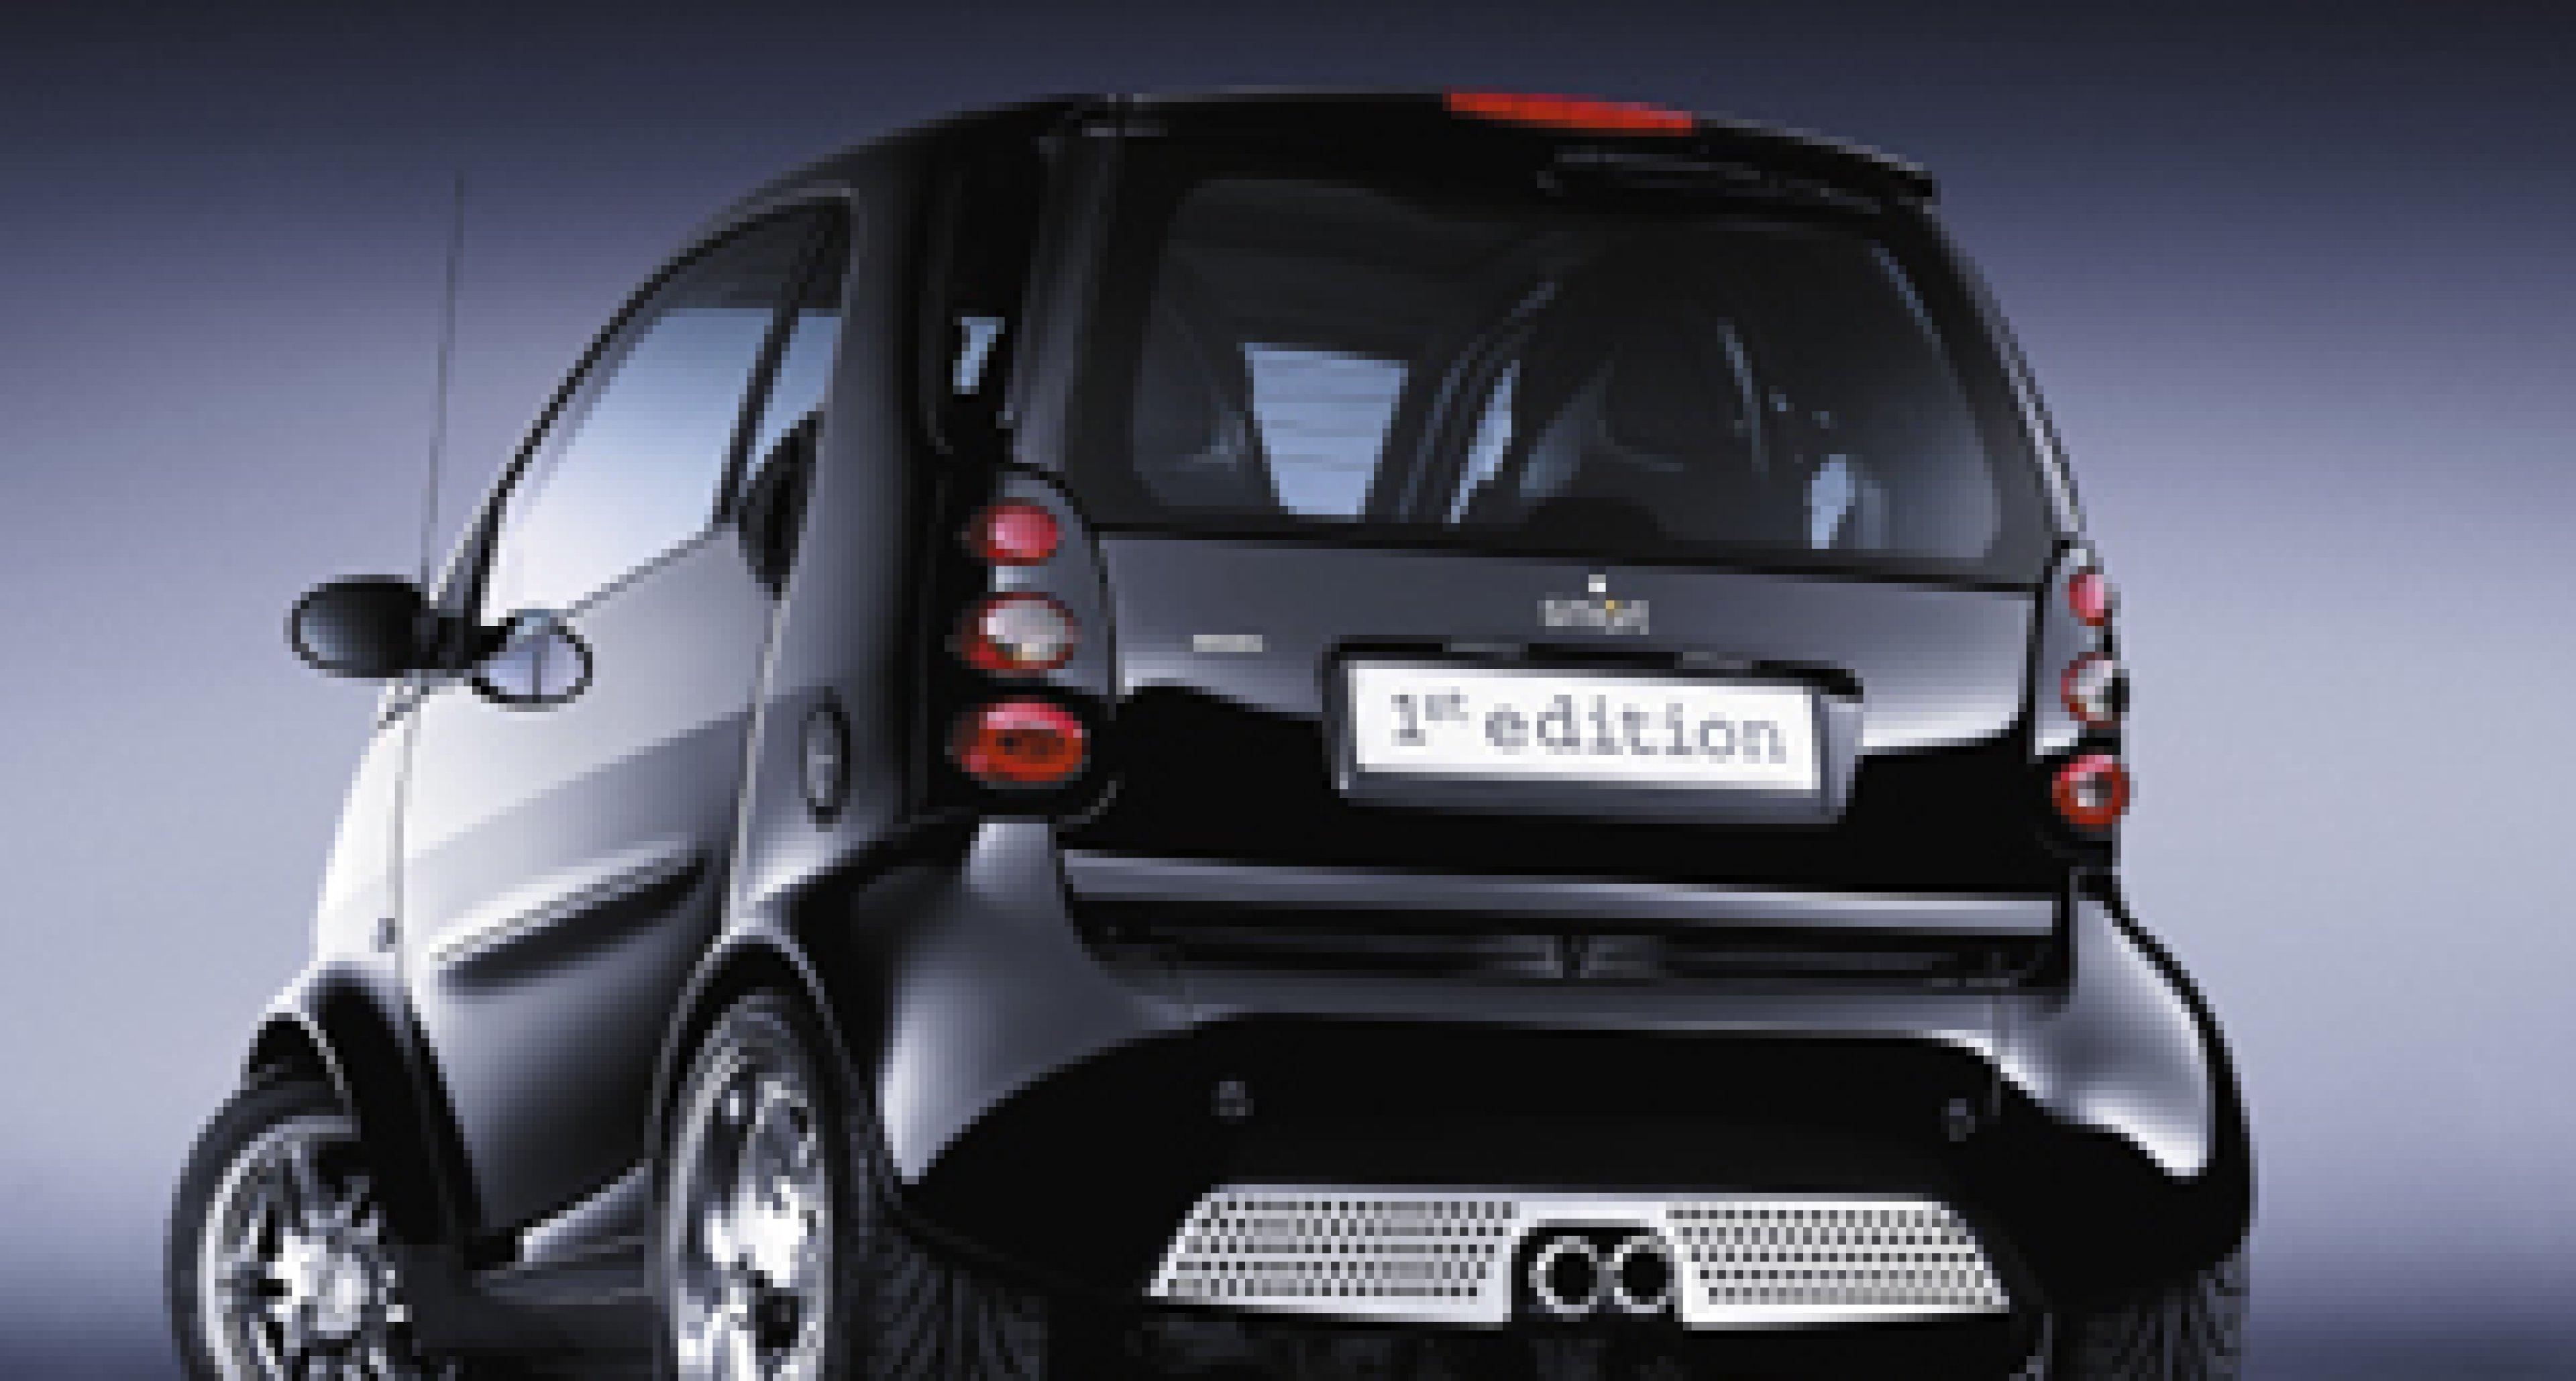 smart-Brabus GmbH extends the smart product range